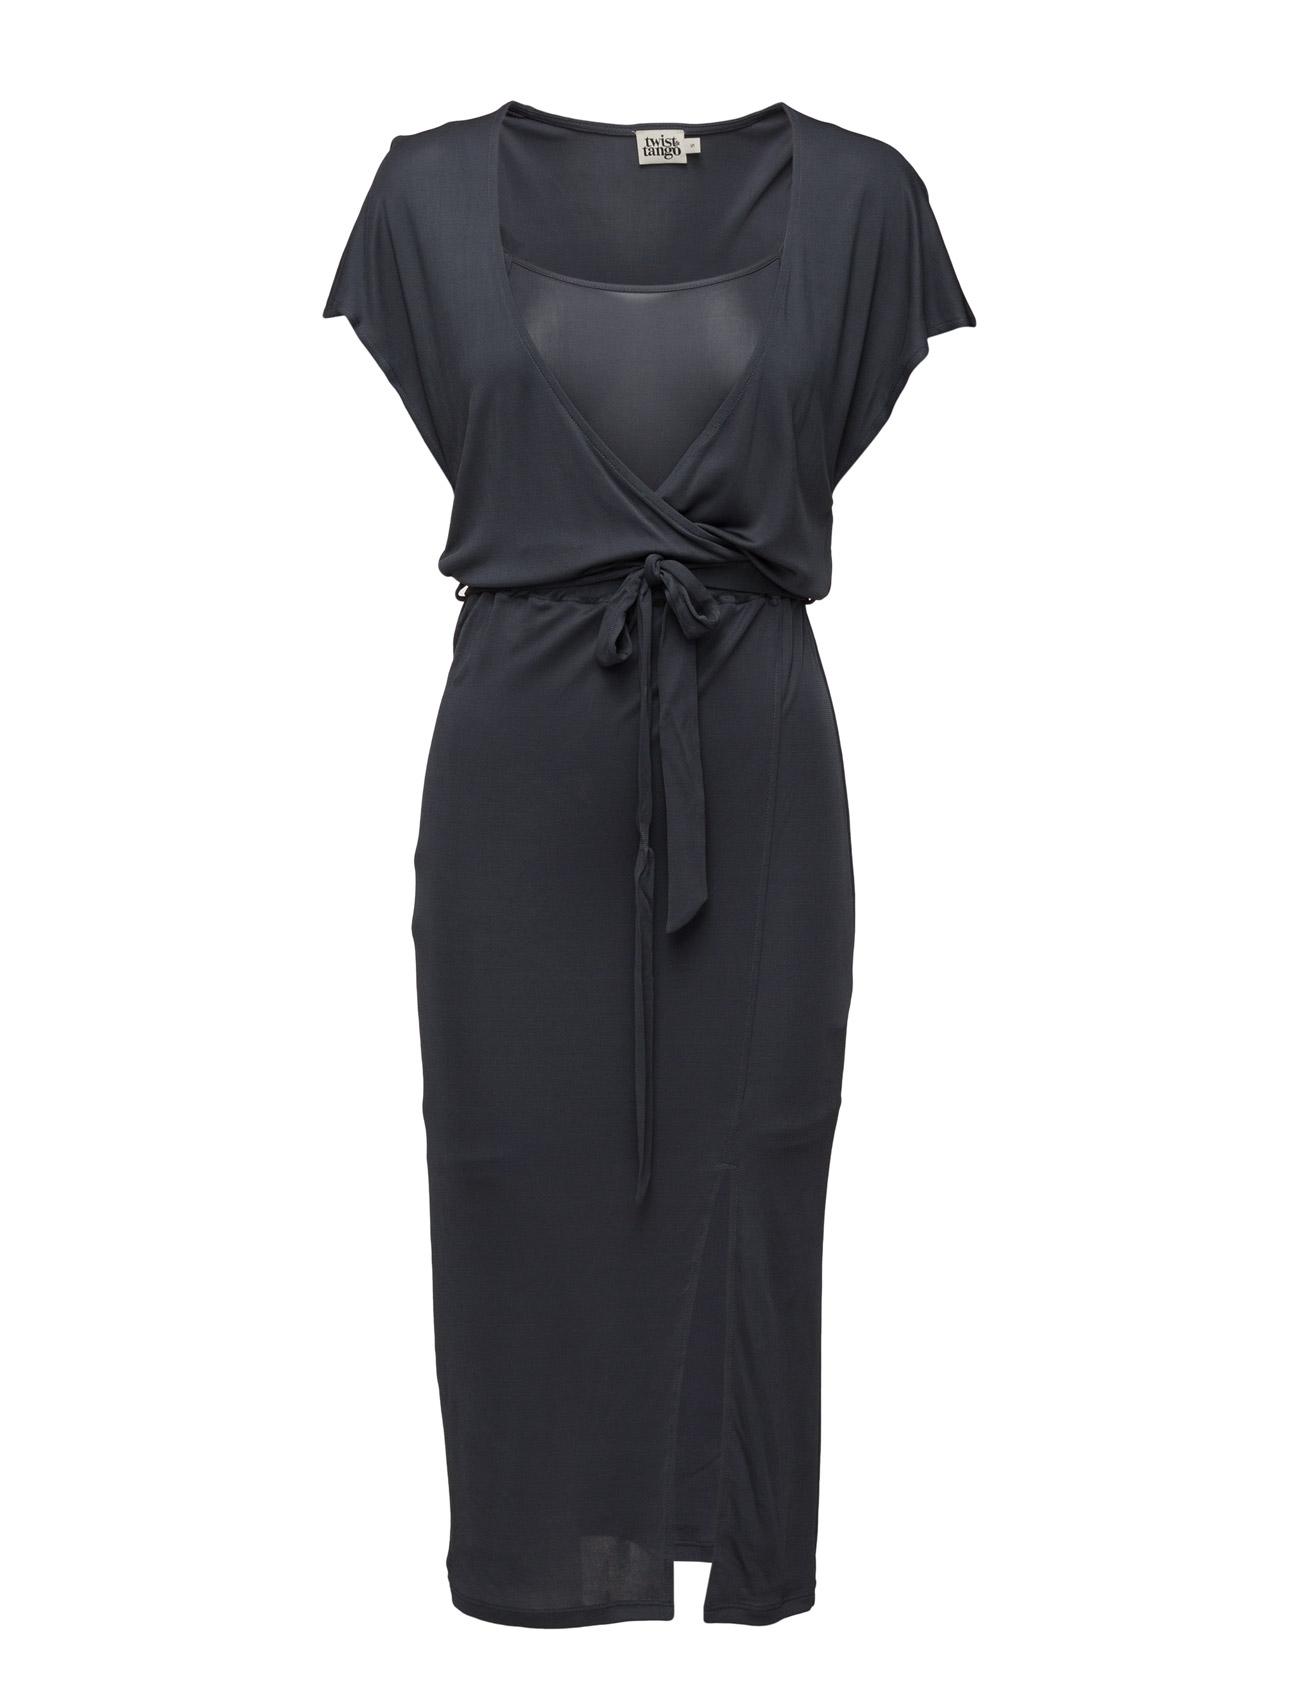 Isabella Dress Twist & Tango Kjoler til Kvinder i Iron Blå